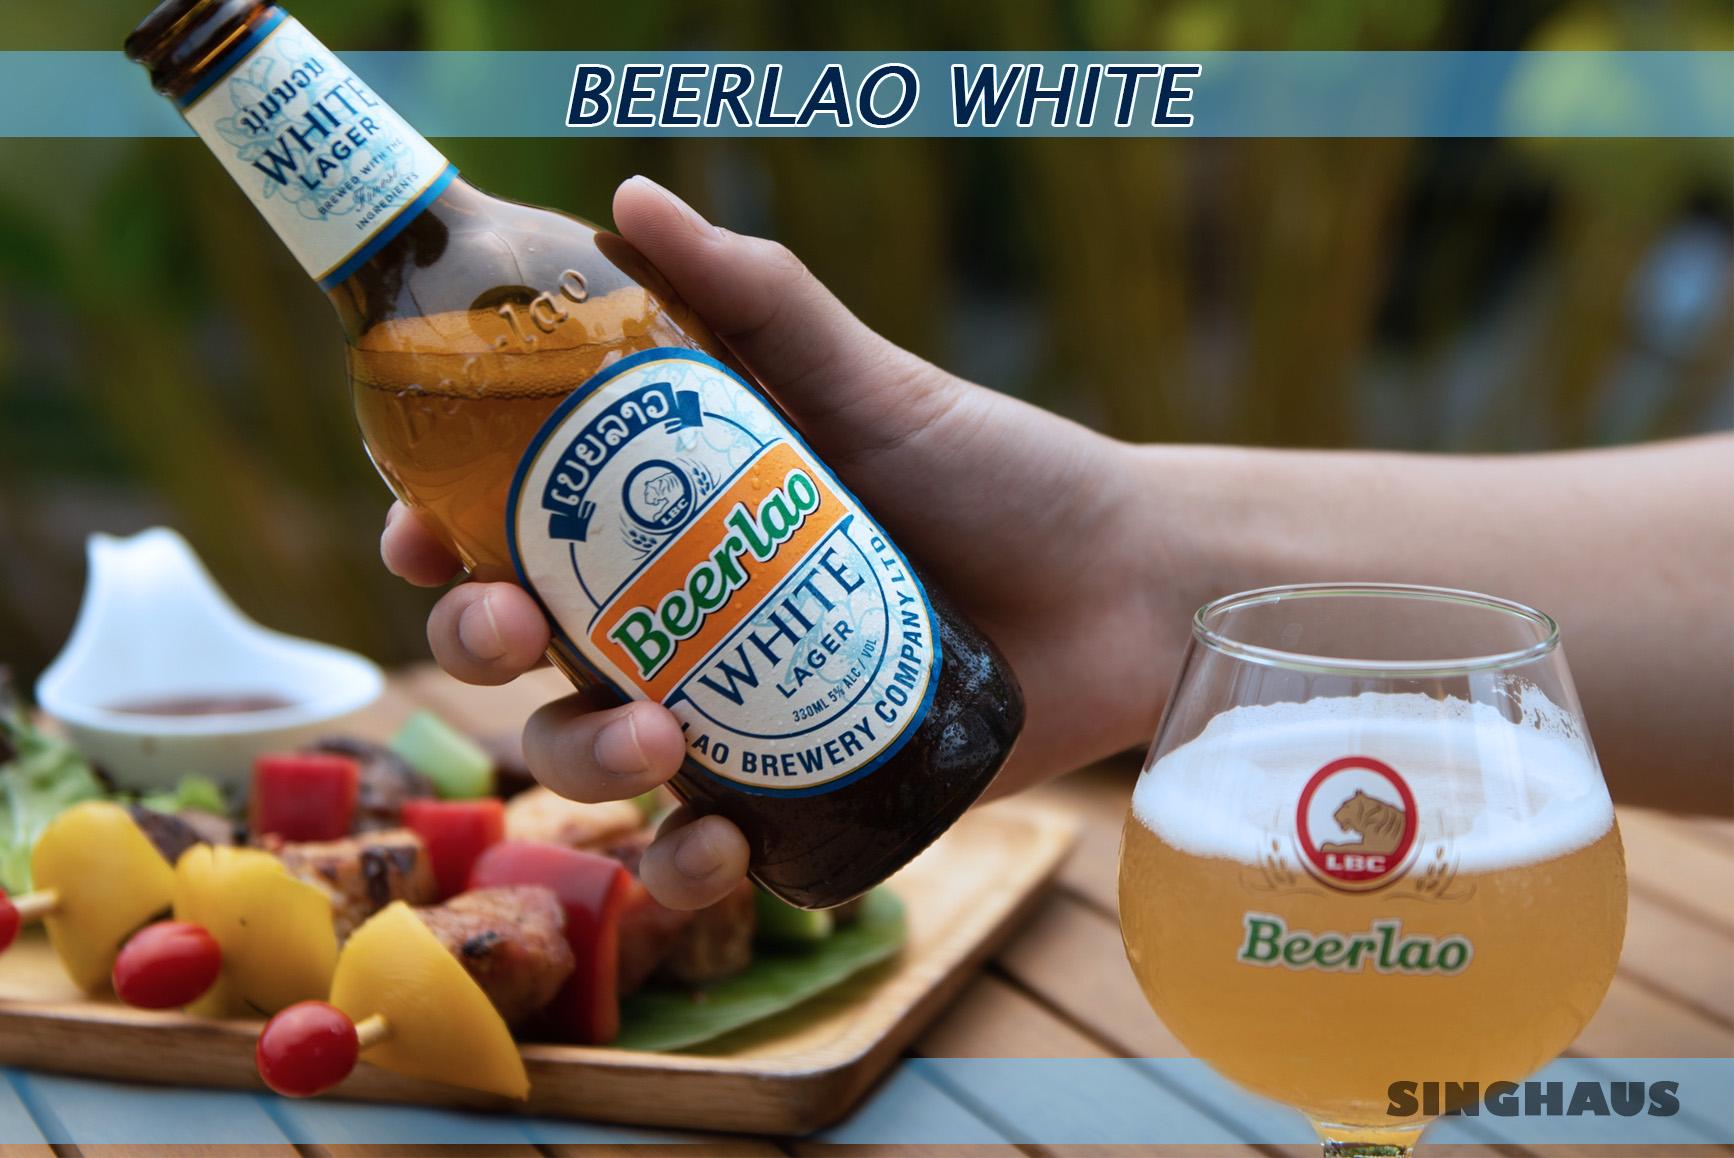 BeerLao White